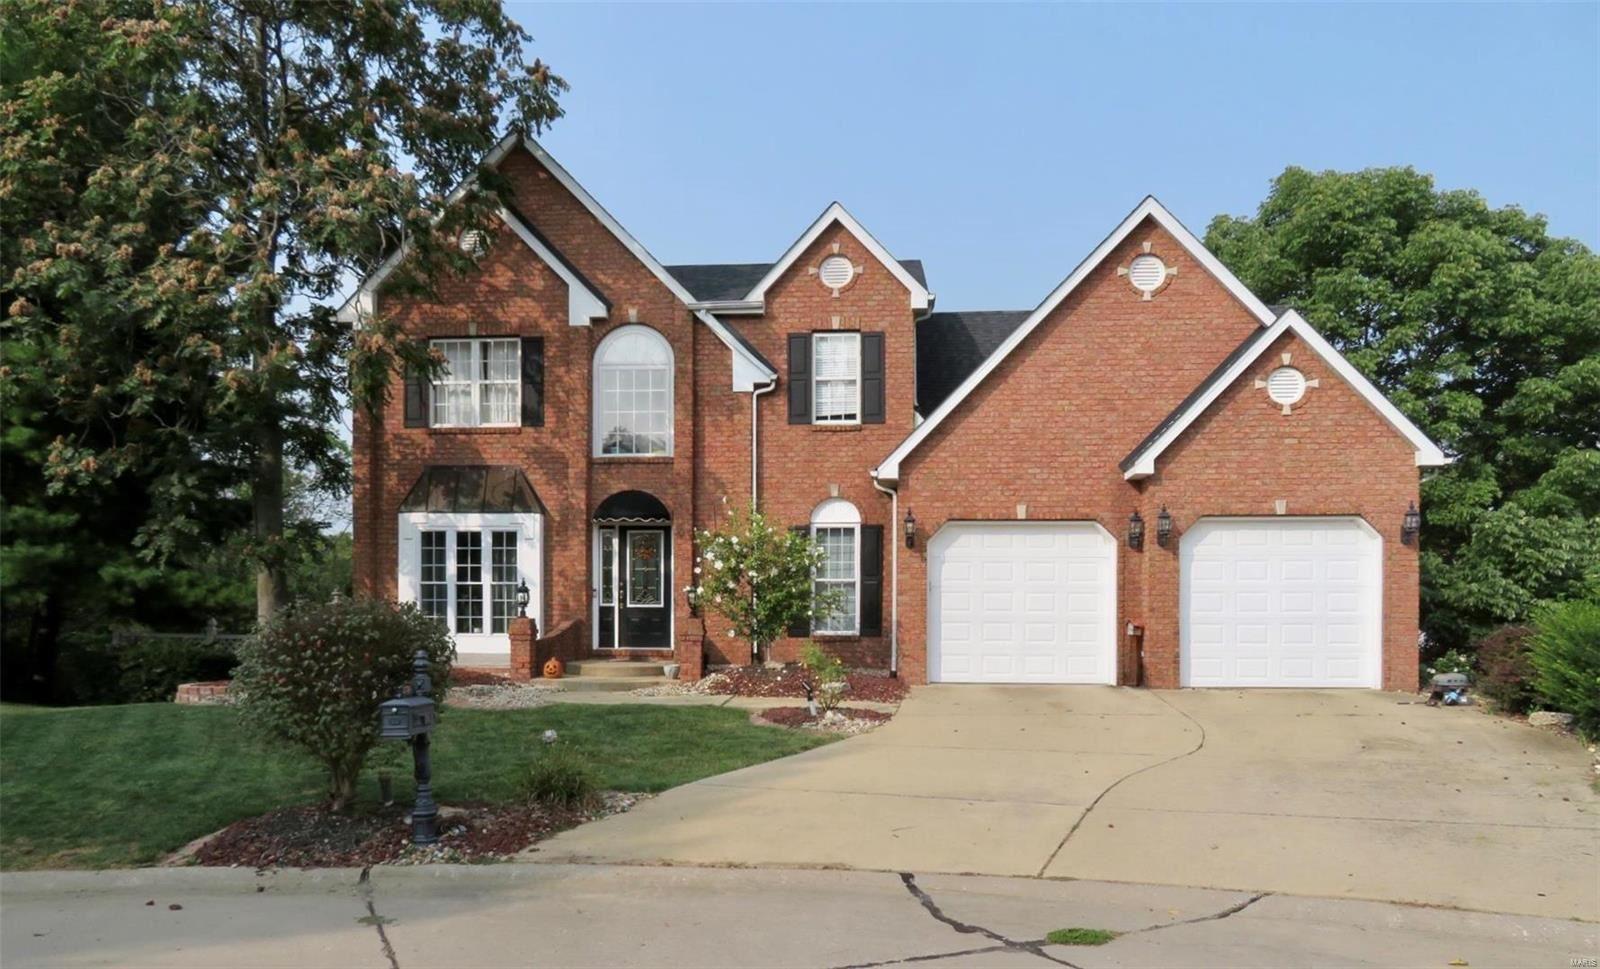 2724 Lakebridge Court, Maryville, IL 62062 - MLS#: 20068476